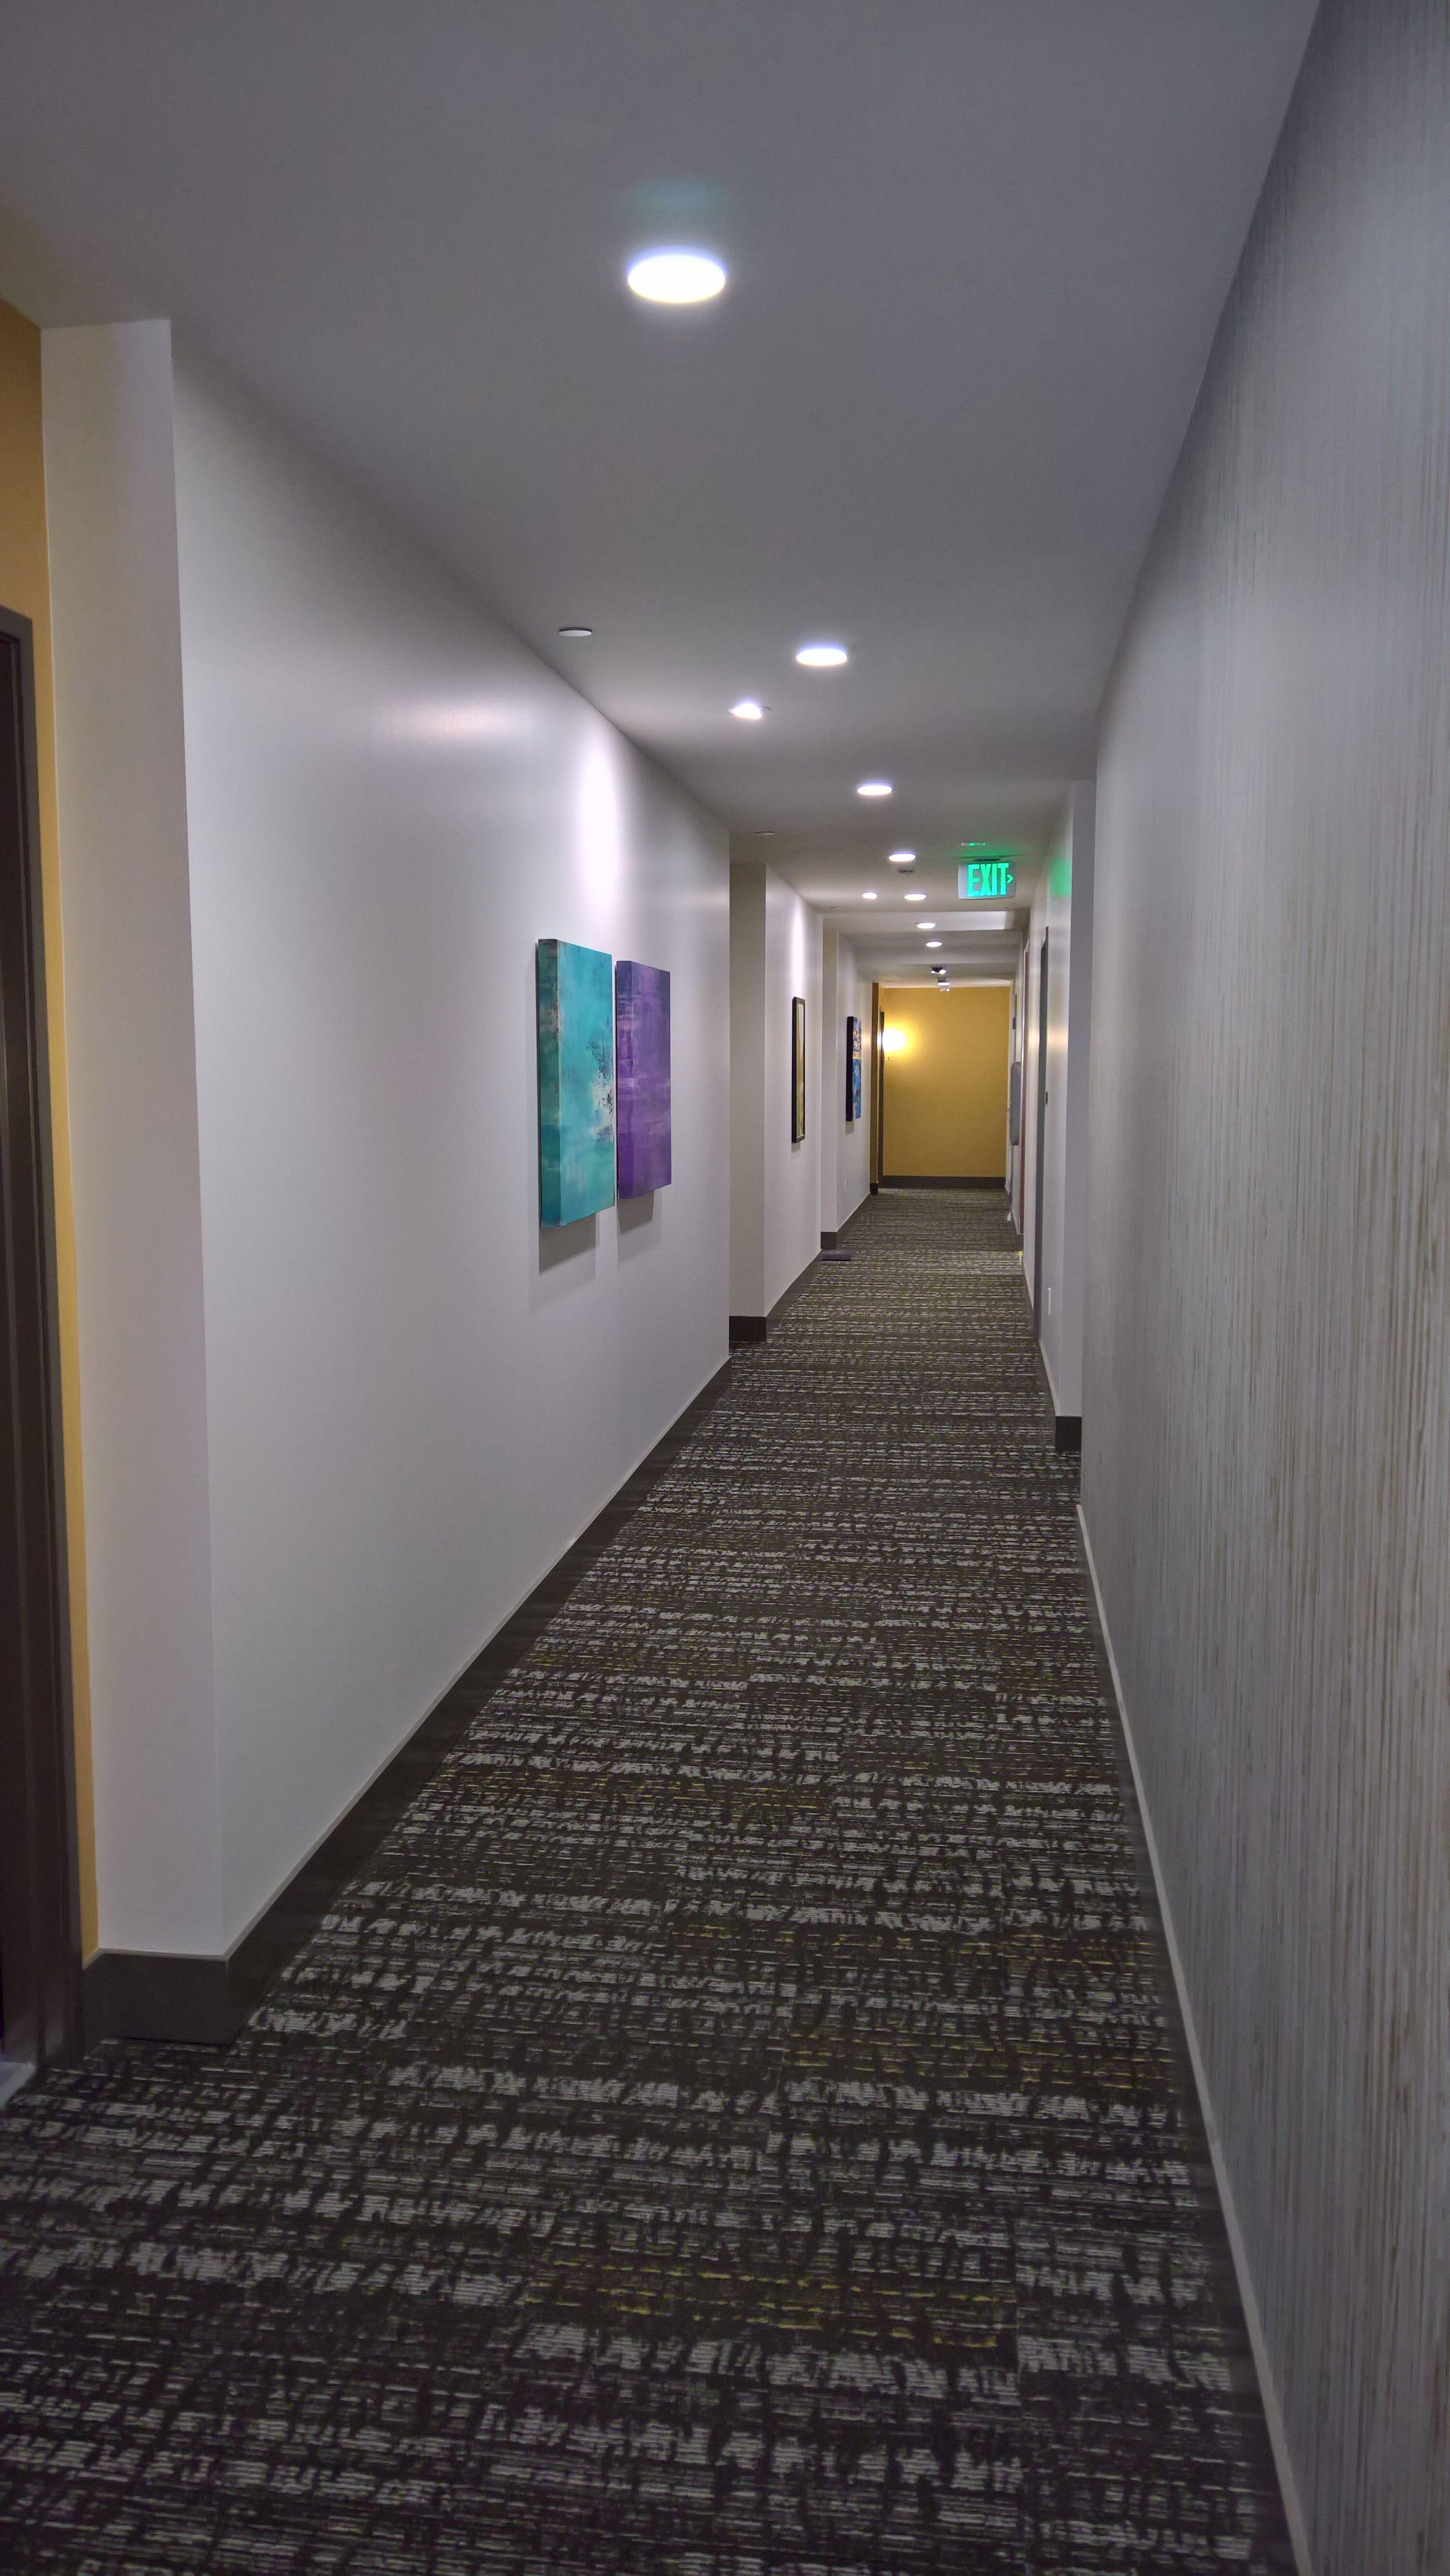 Pin By Heather Saldana On Professional Hotel Hallway Condo Design Hallway Designs